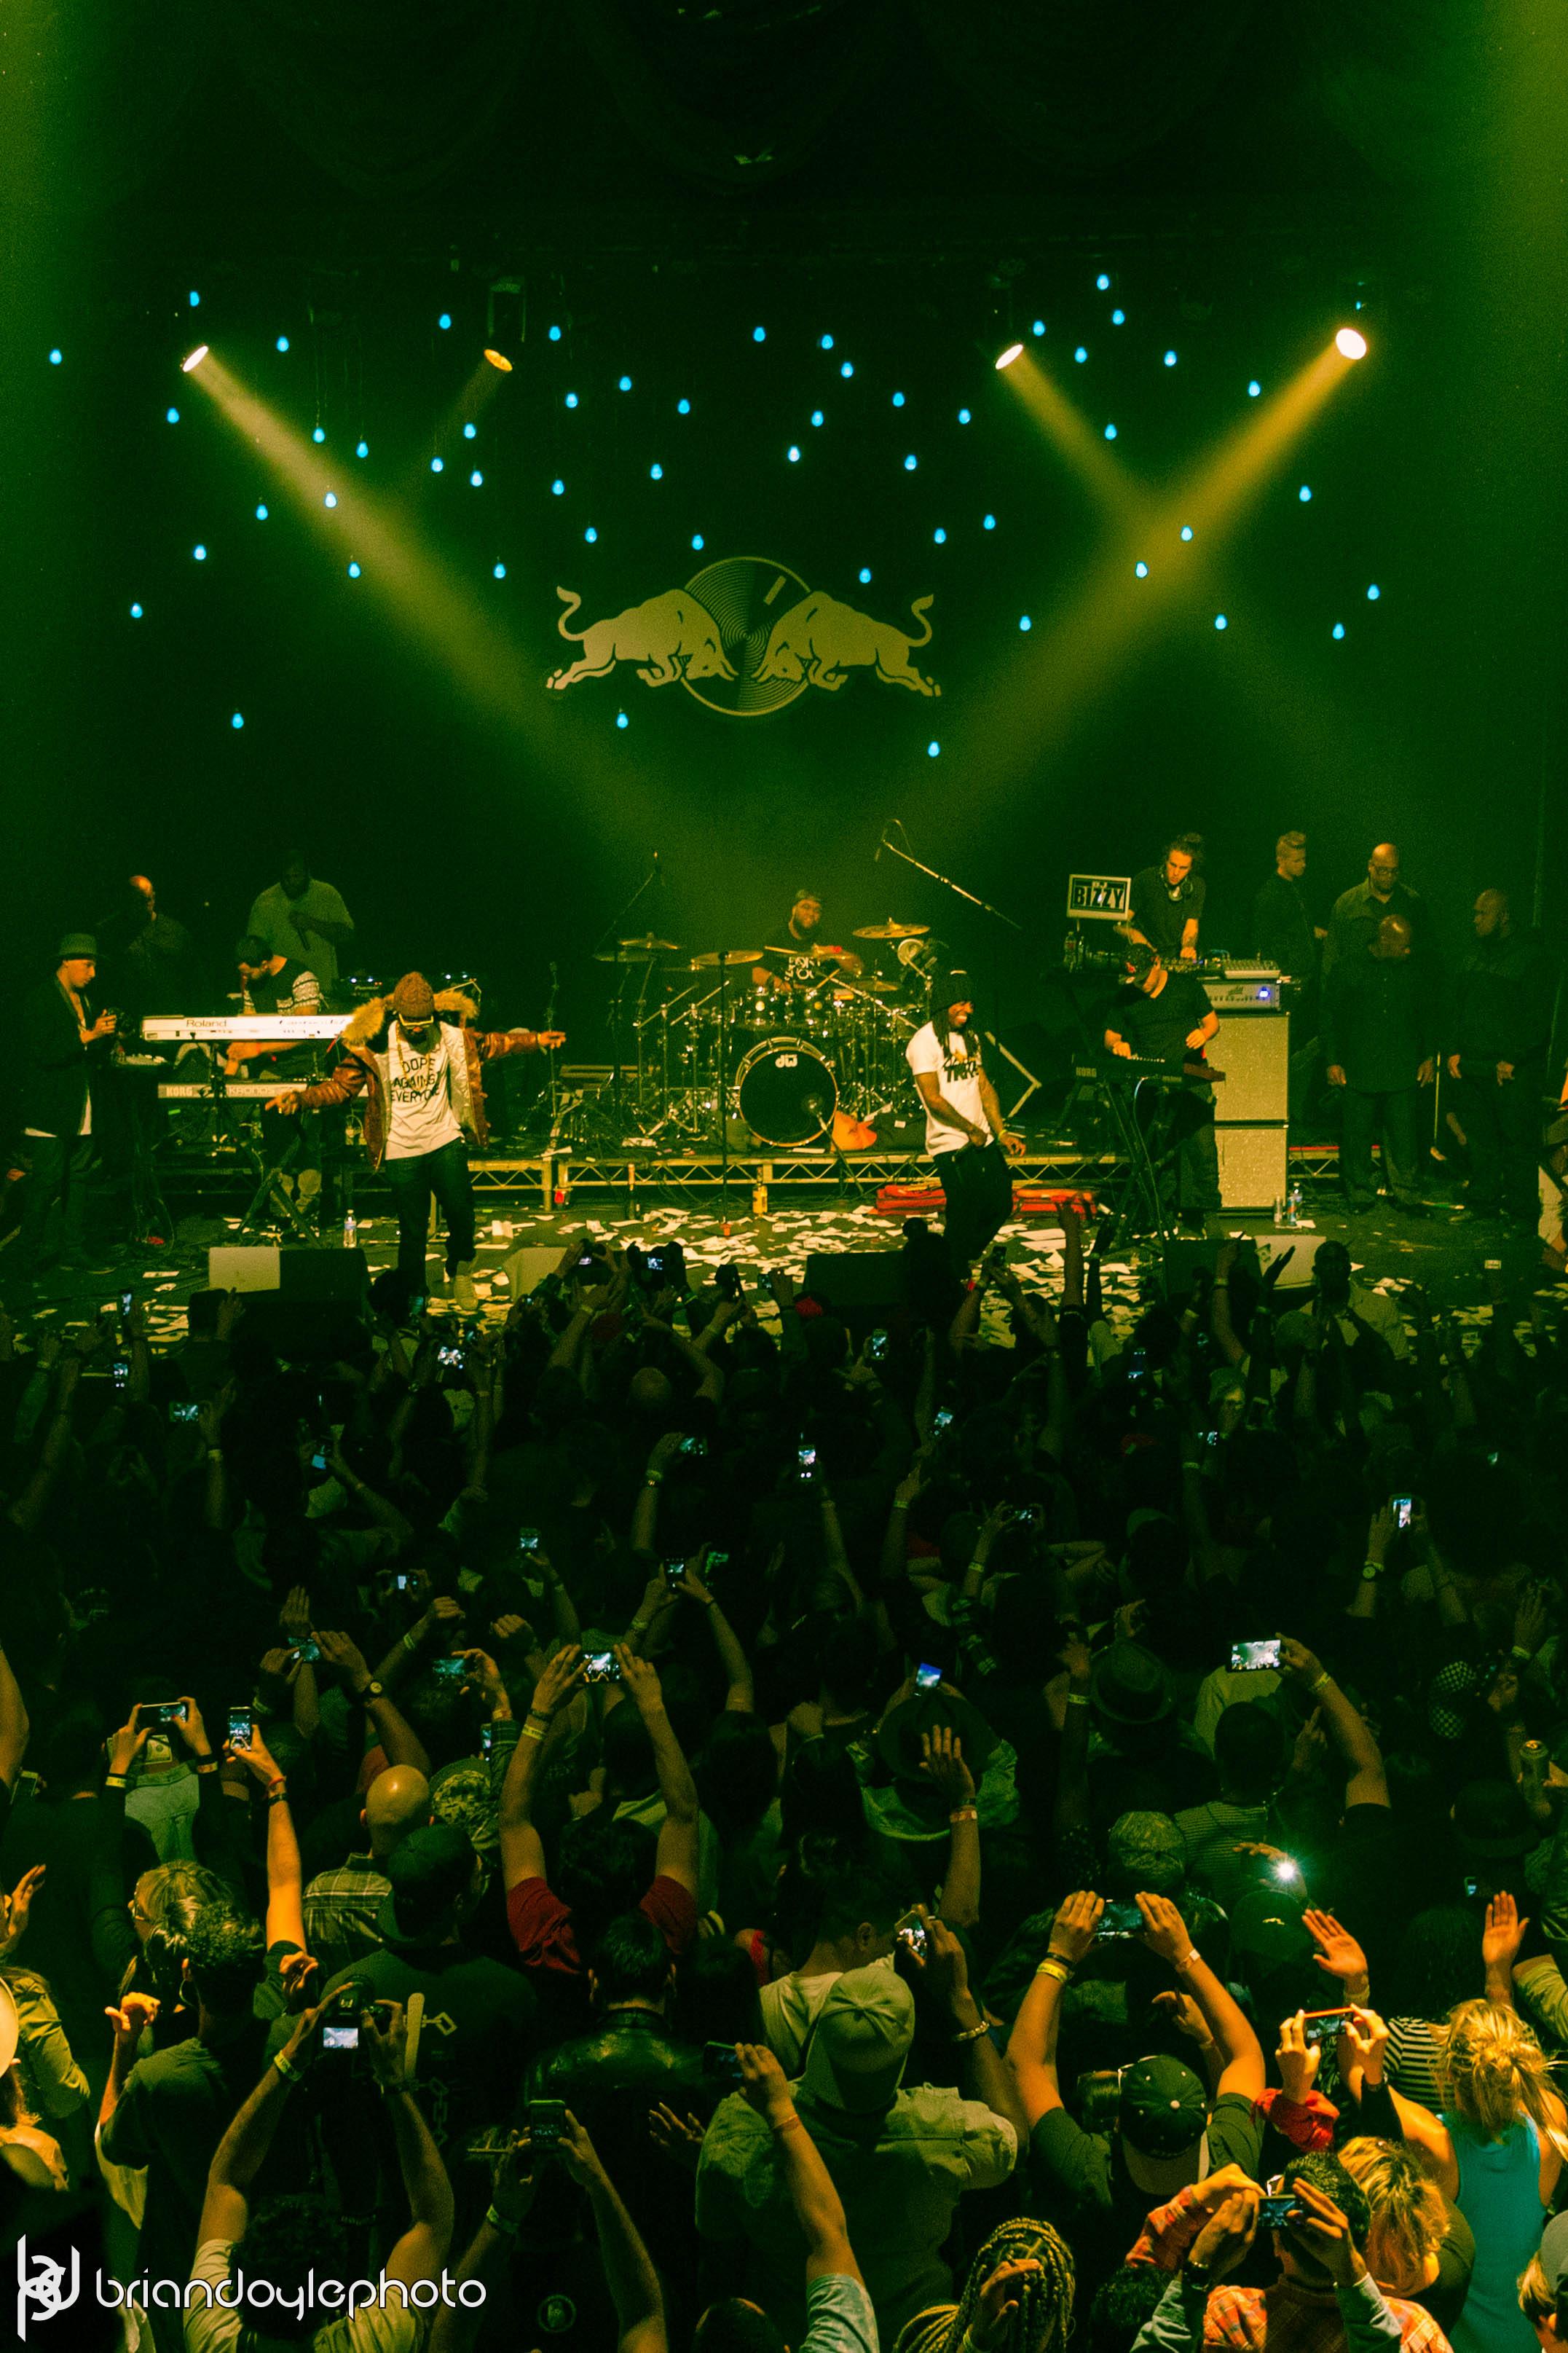 Lil Wayne, Juicy J, Two-9, Tree @ The Fonda 25.11.2014-39.jpg